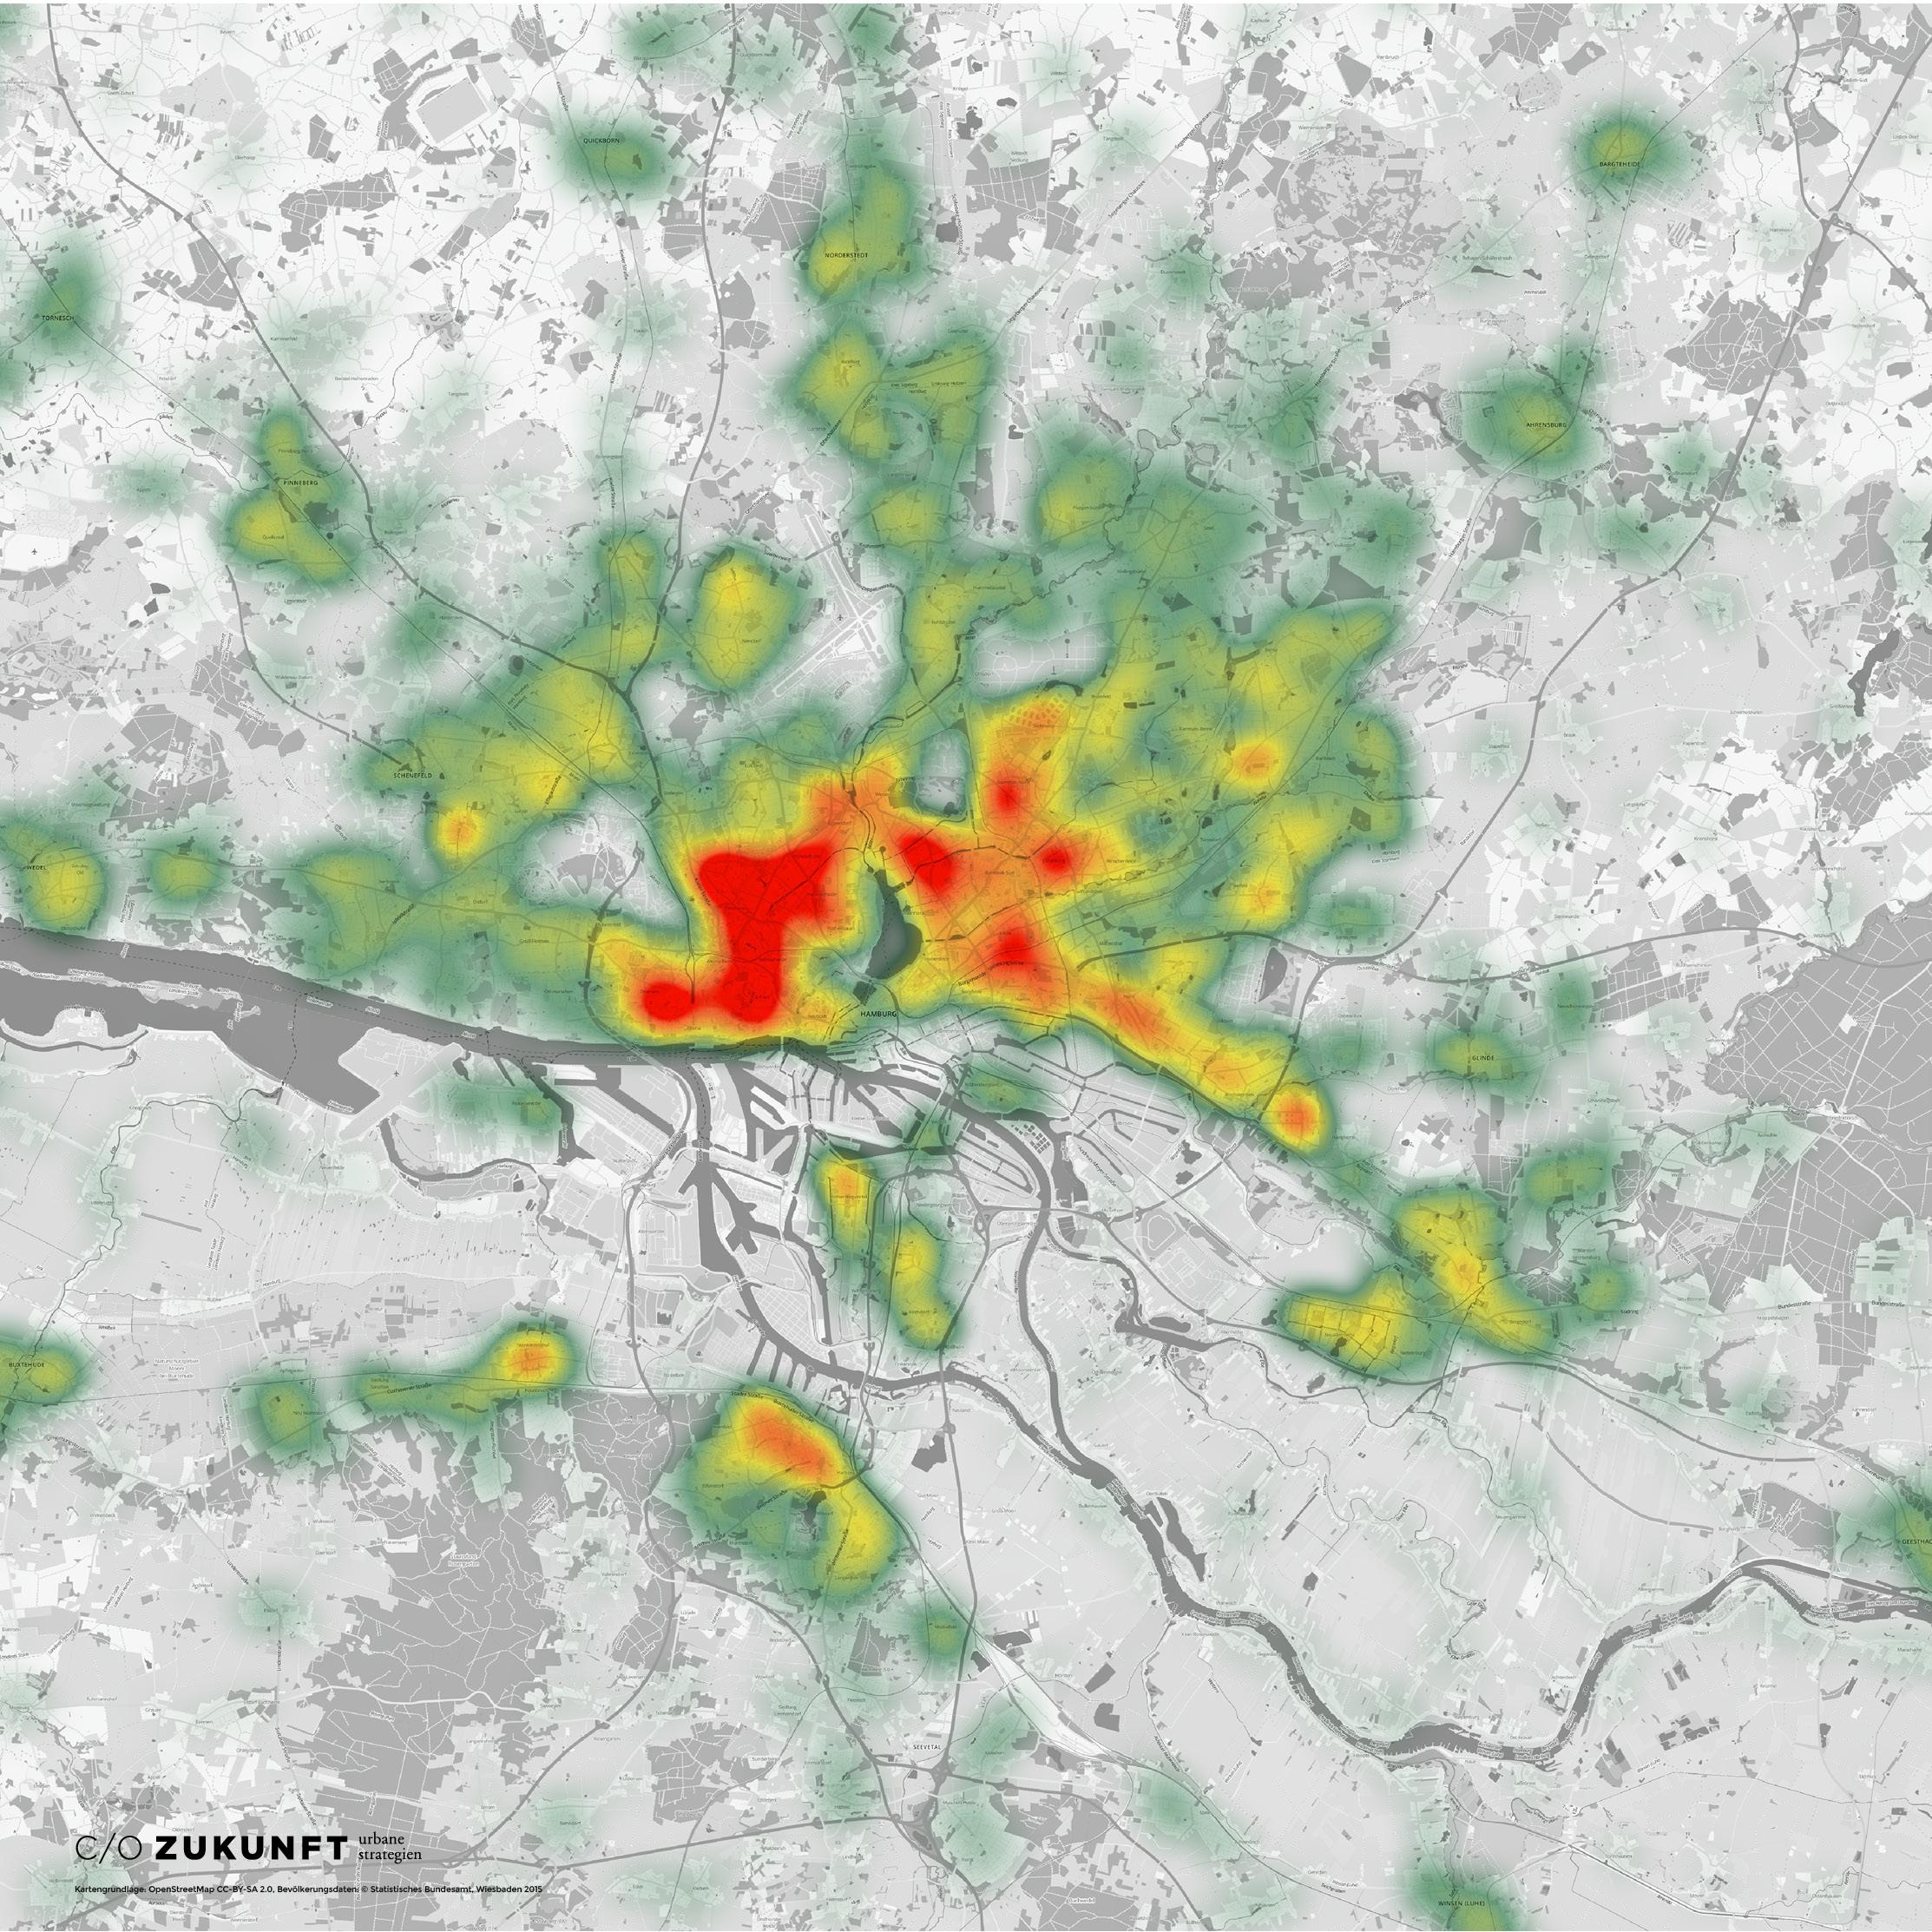 bevölkerungsdichte berlin 2016